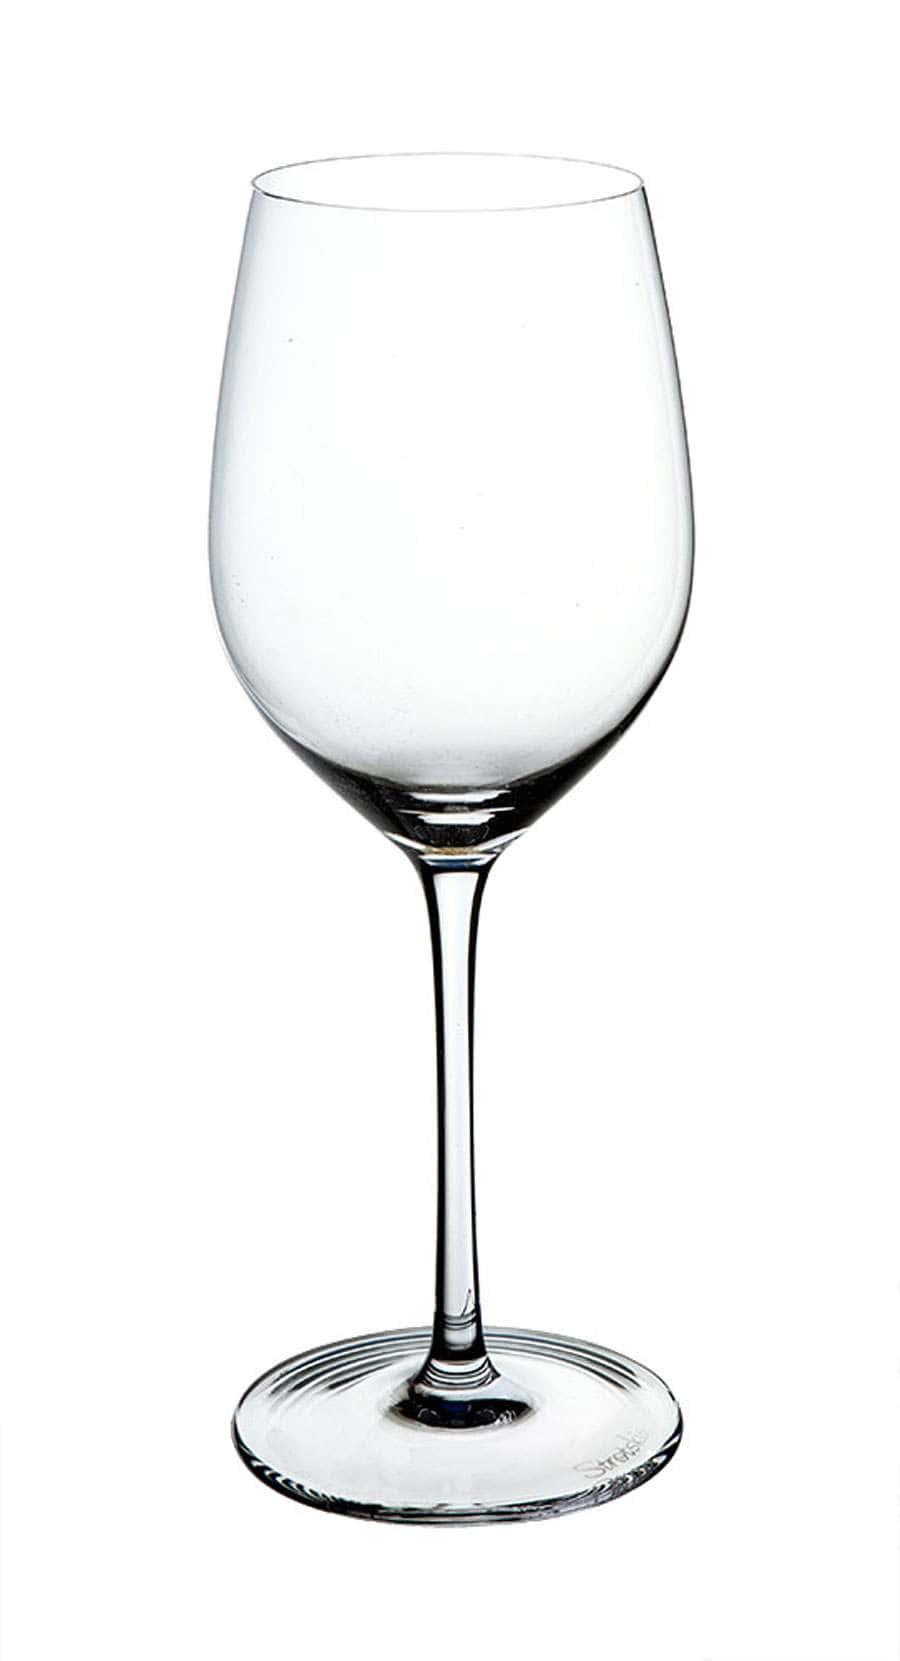 Росси бокалы для белого вина 360 мл 225 мм 6 шт Строцкис